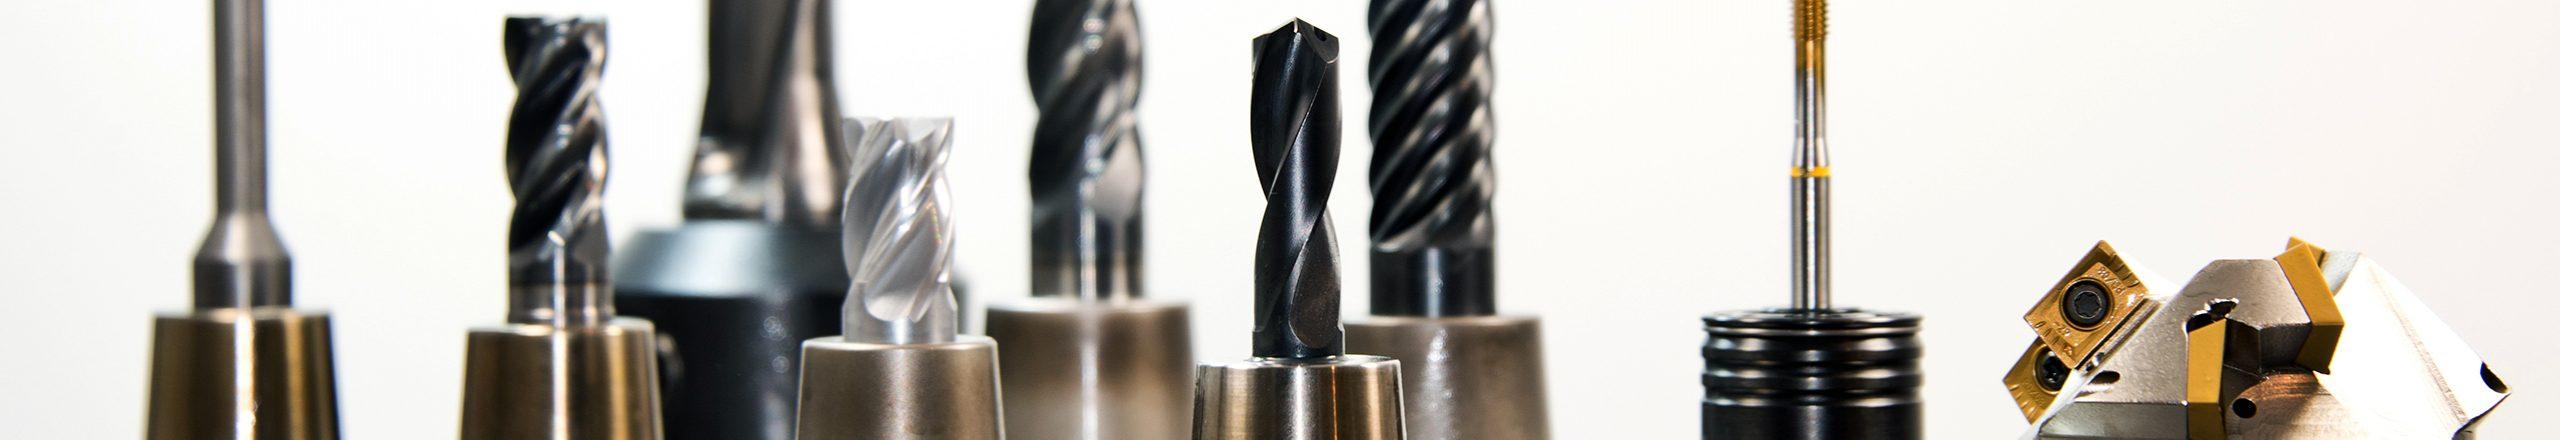 cnc machine tool holders